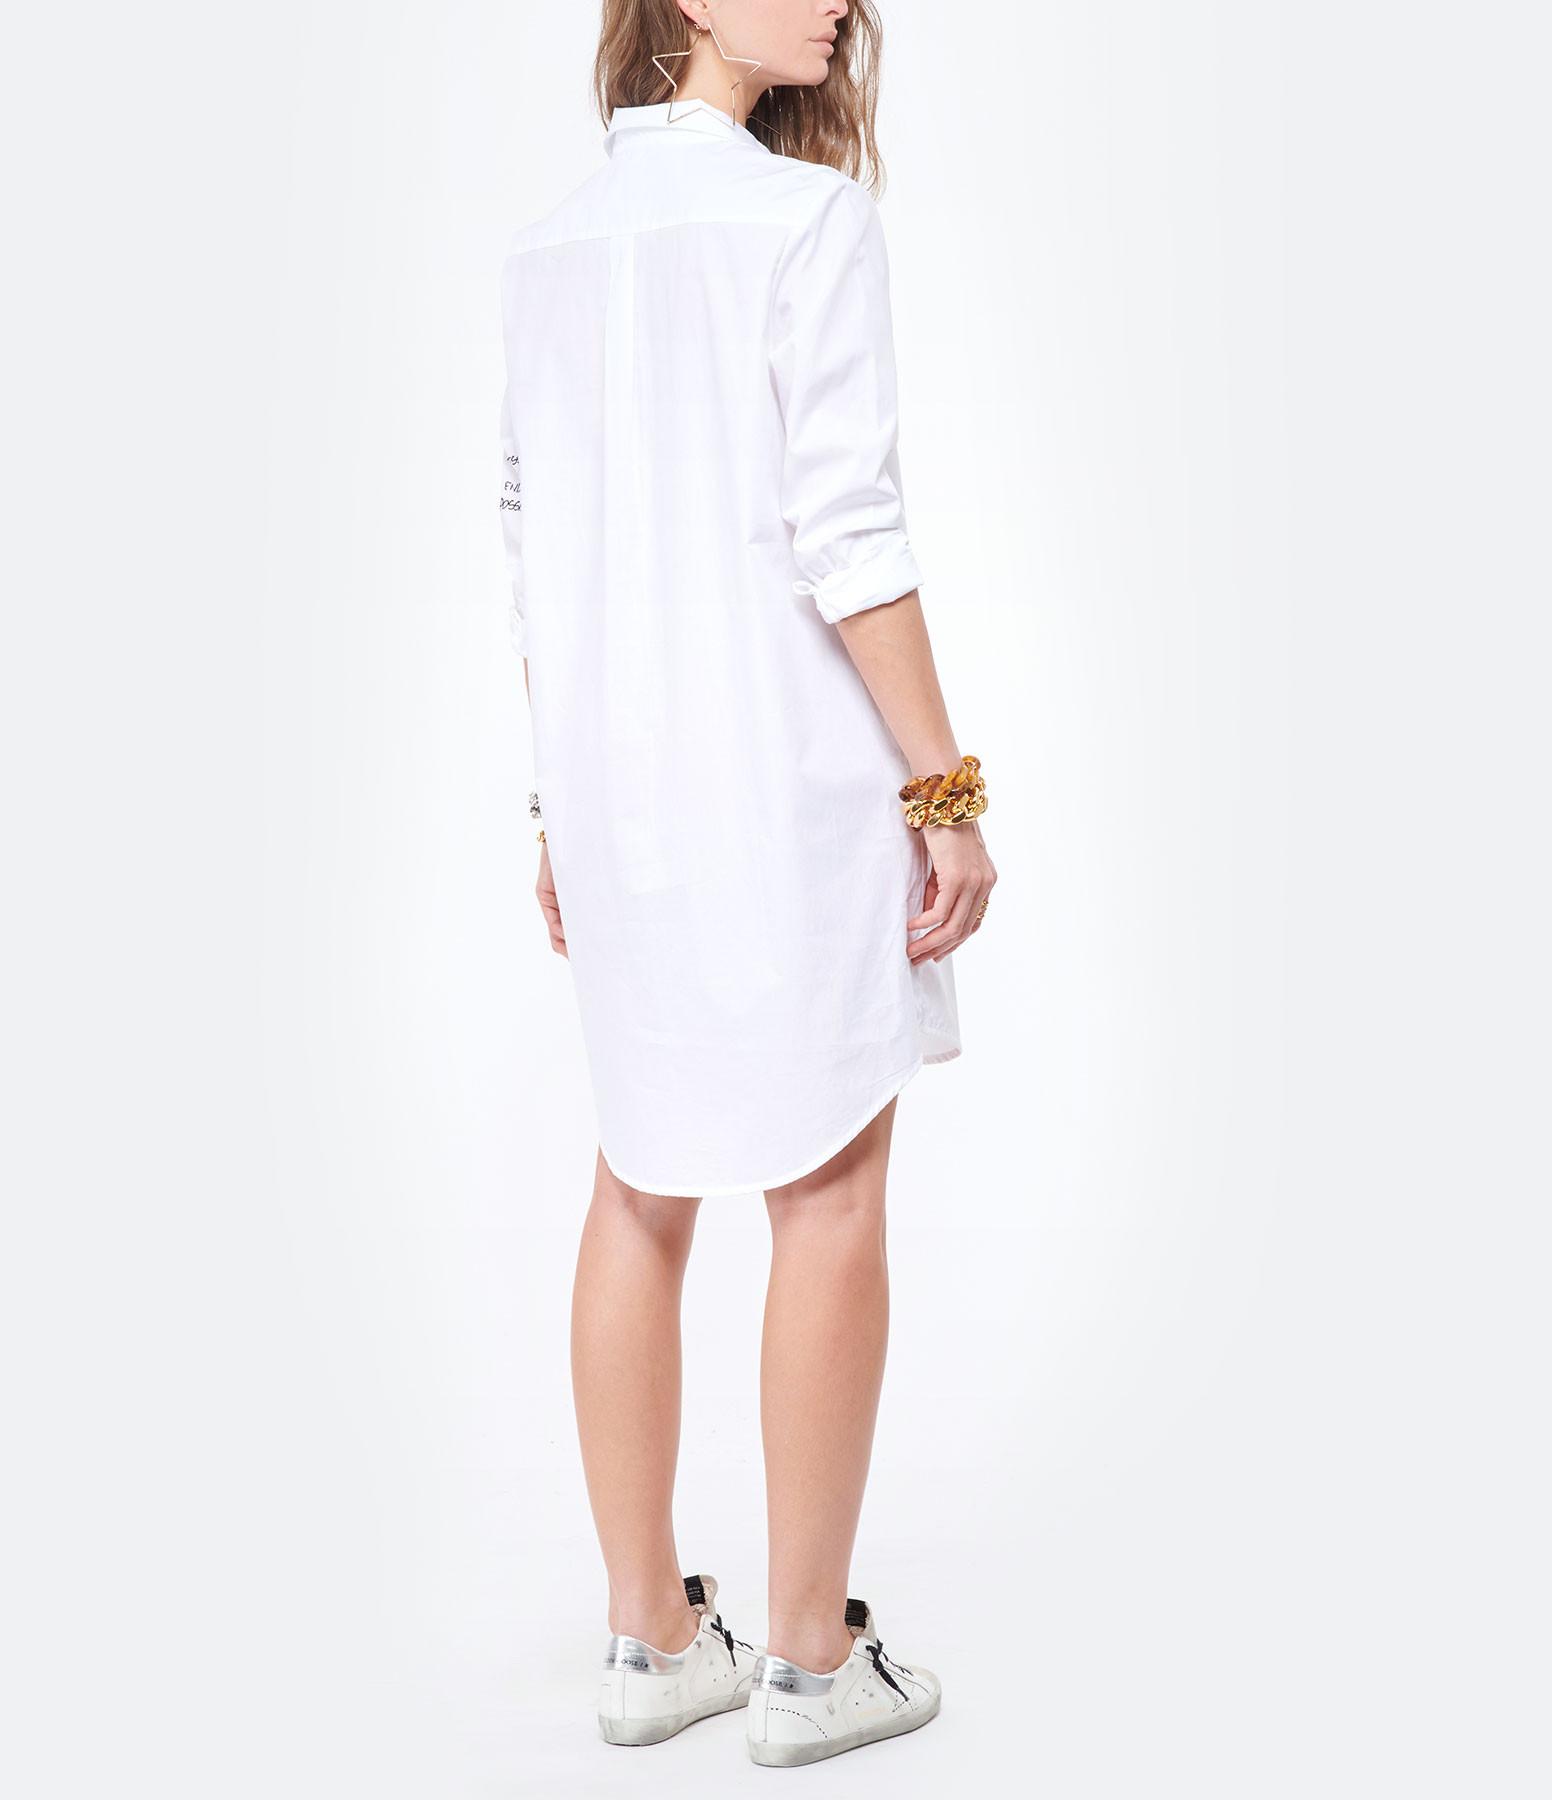 JEANNE VOULAND - Robe Chemise Faidy Coton Brodé Blanc